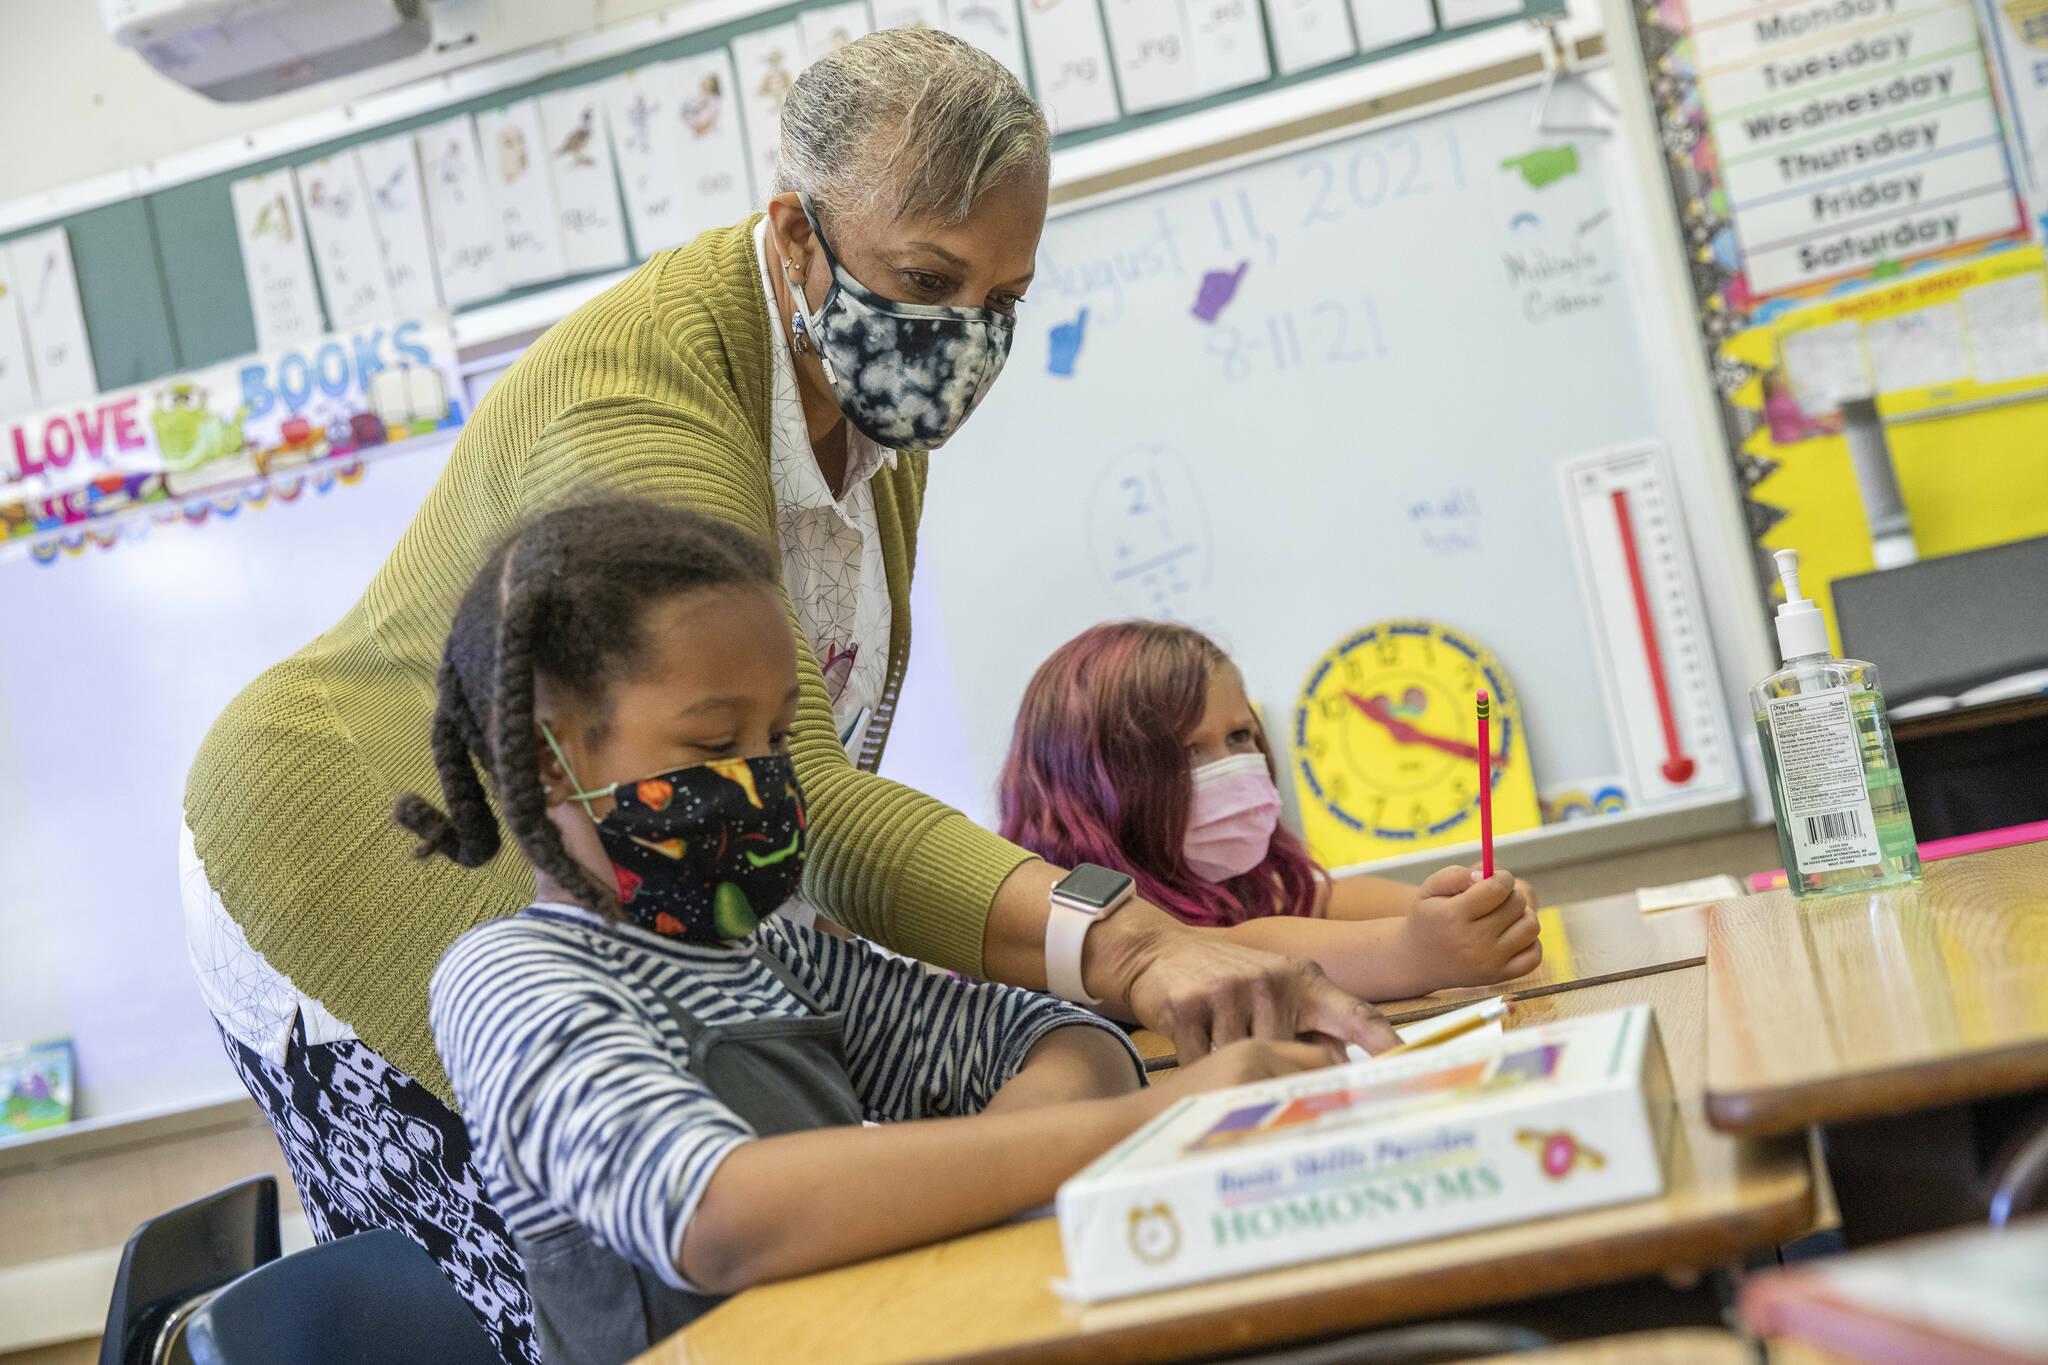 Teacher Joy Harrison instructs her second graders as California Gov. Gavin Newsom visits the classroom at Carl B. Munck Elementary School, Wednesday, Aug. 11, 2021, in Oakland, Calif. Gov. (Santiago Mejia/San Francisco Chronicle via AP, Pool)